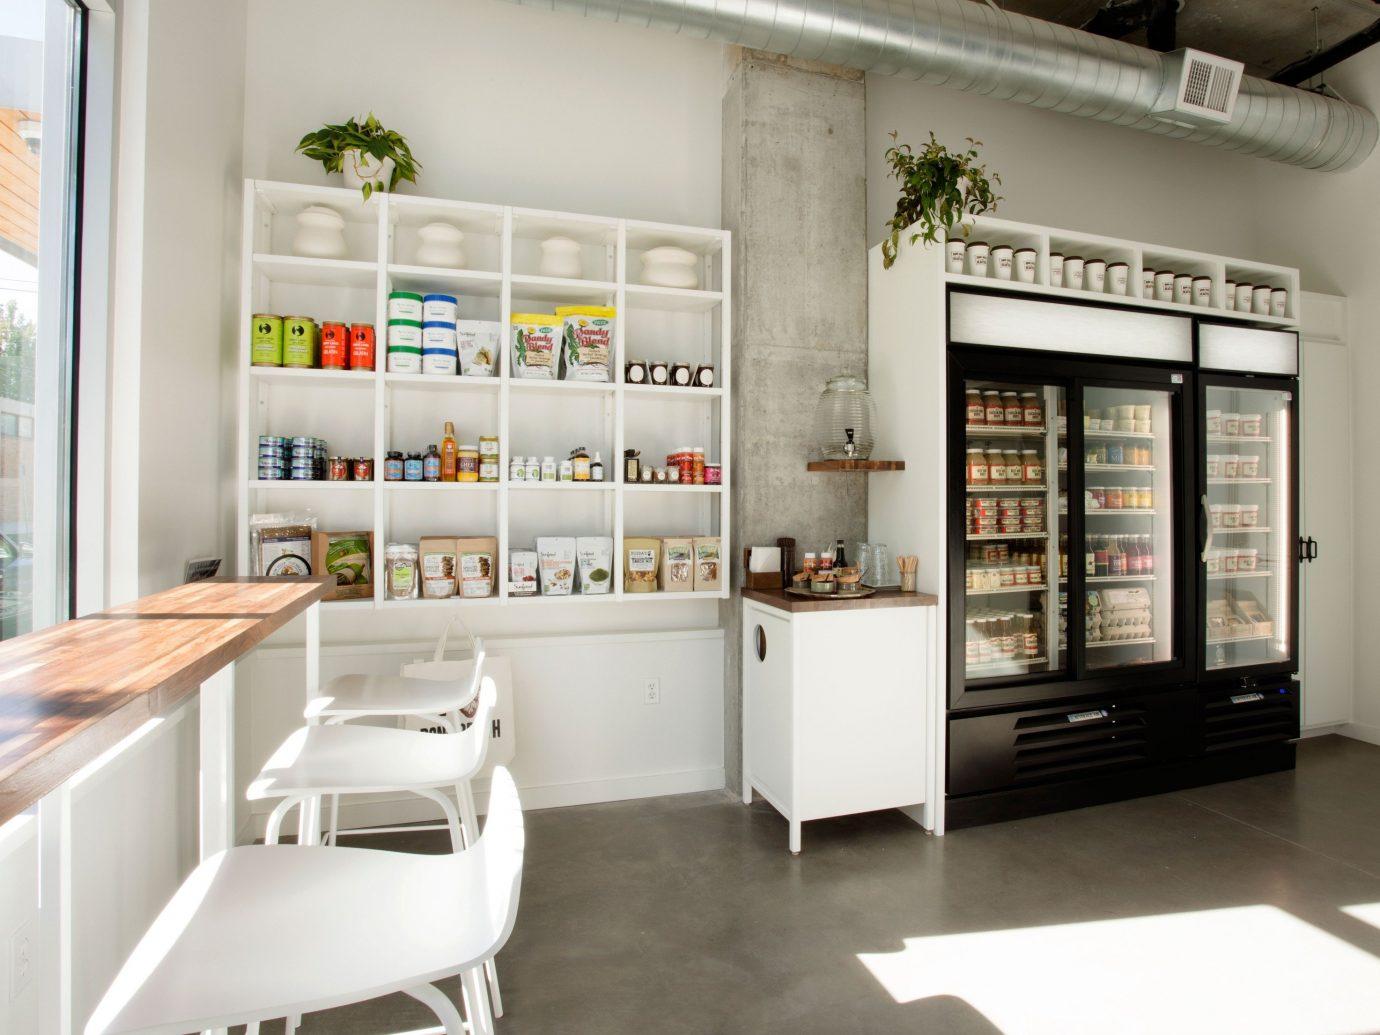 Food + Drink floor indoor property room interior design retail real estate Design cabinetry window covering